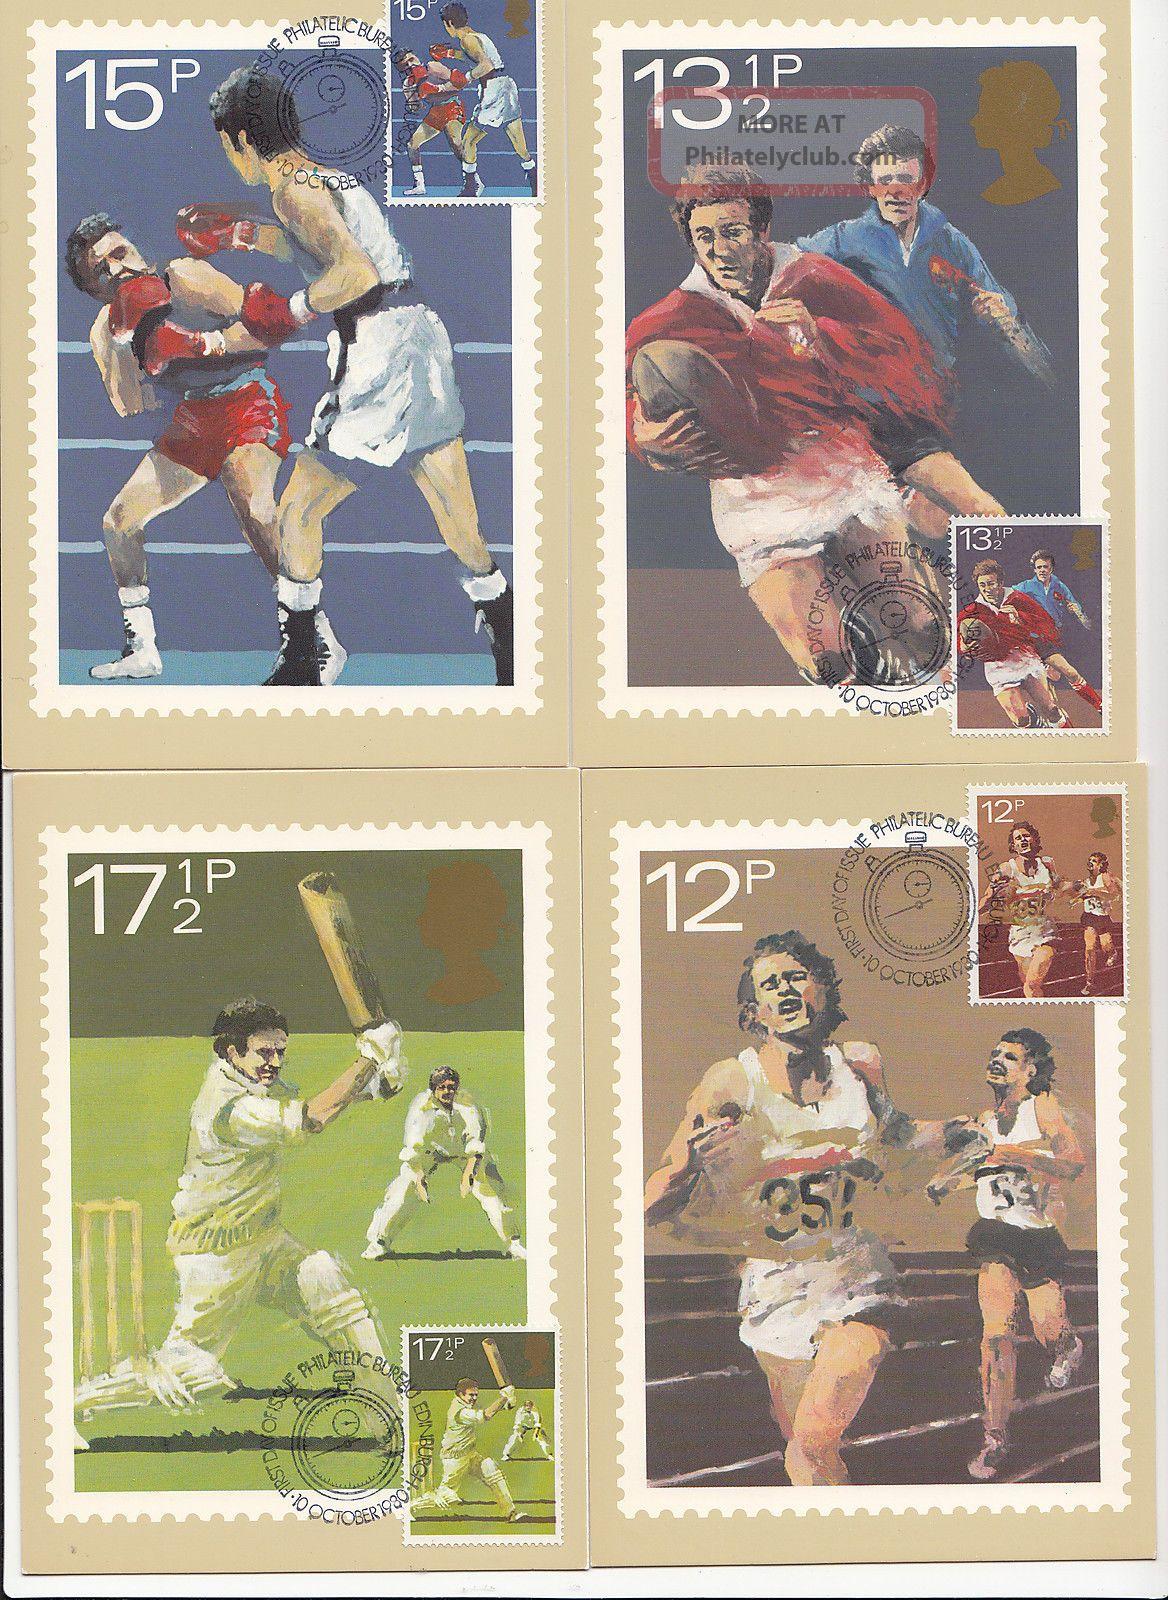 (32420) Gb Phq Fdi Sports Rugby Cricket Maxicard / Postcard Bureau 10 Oct 1980 1971-Now photo